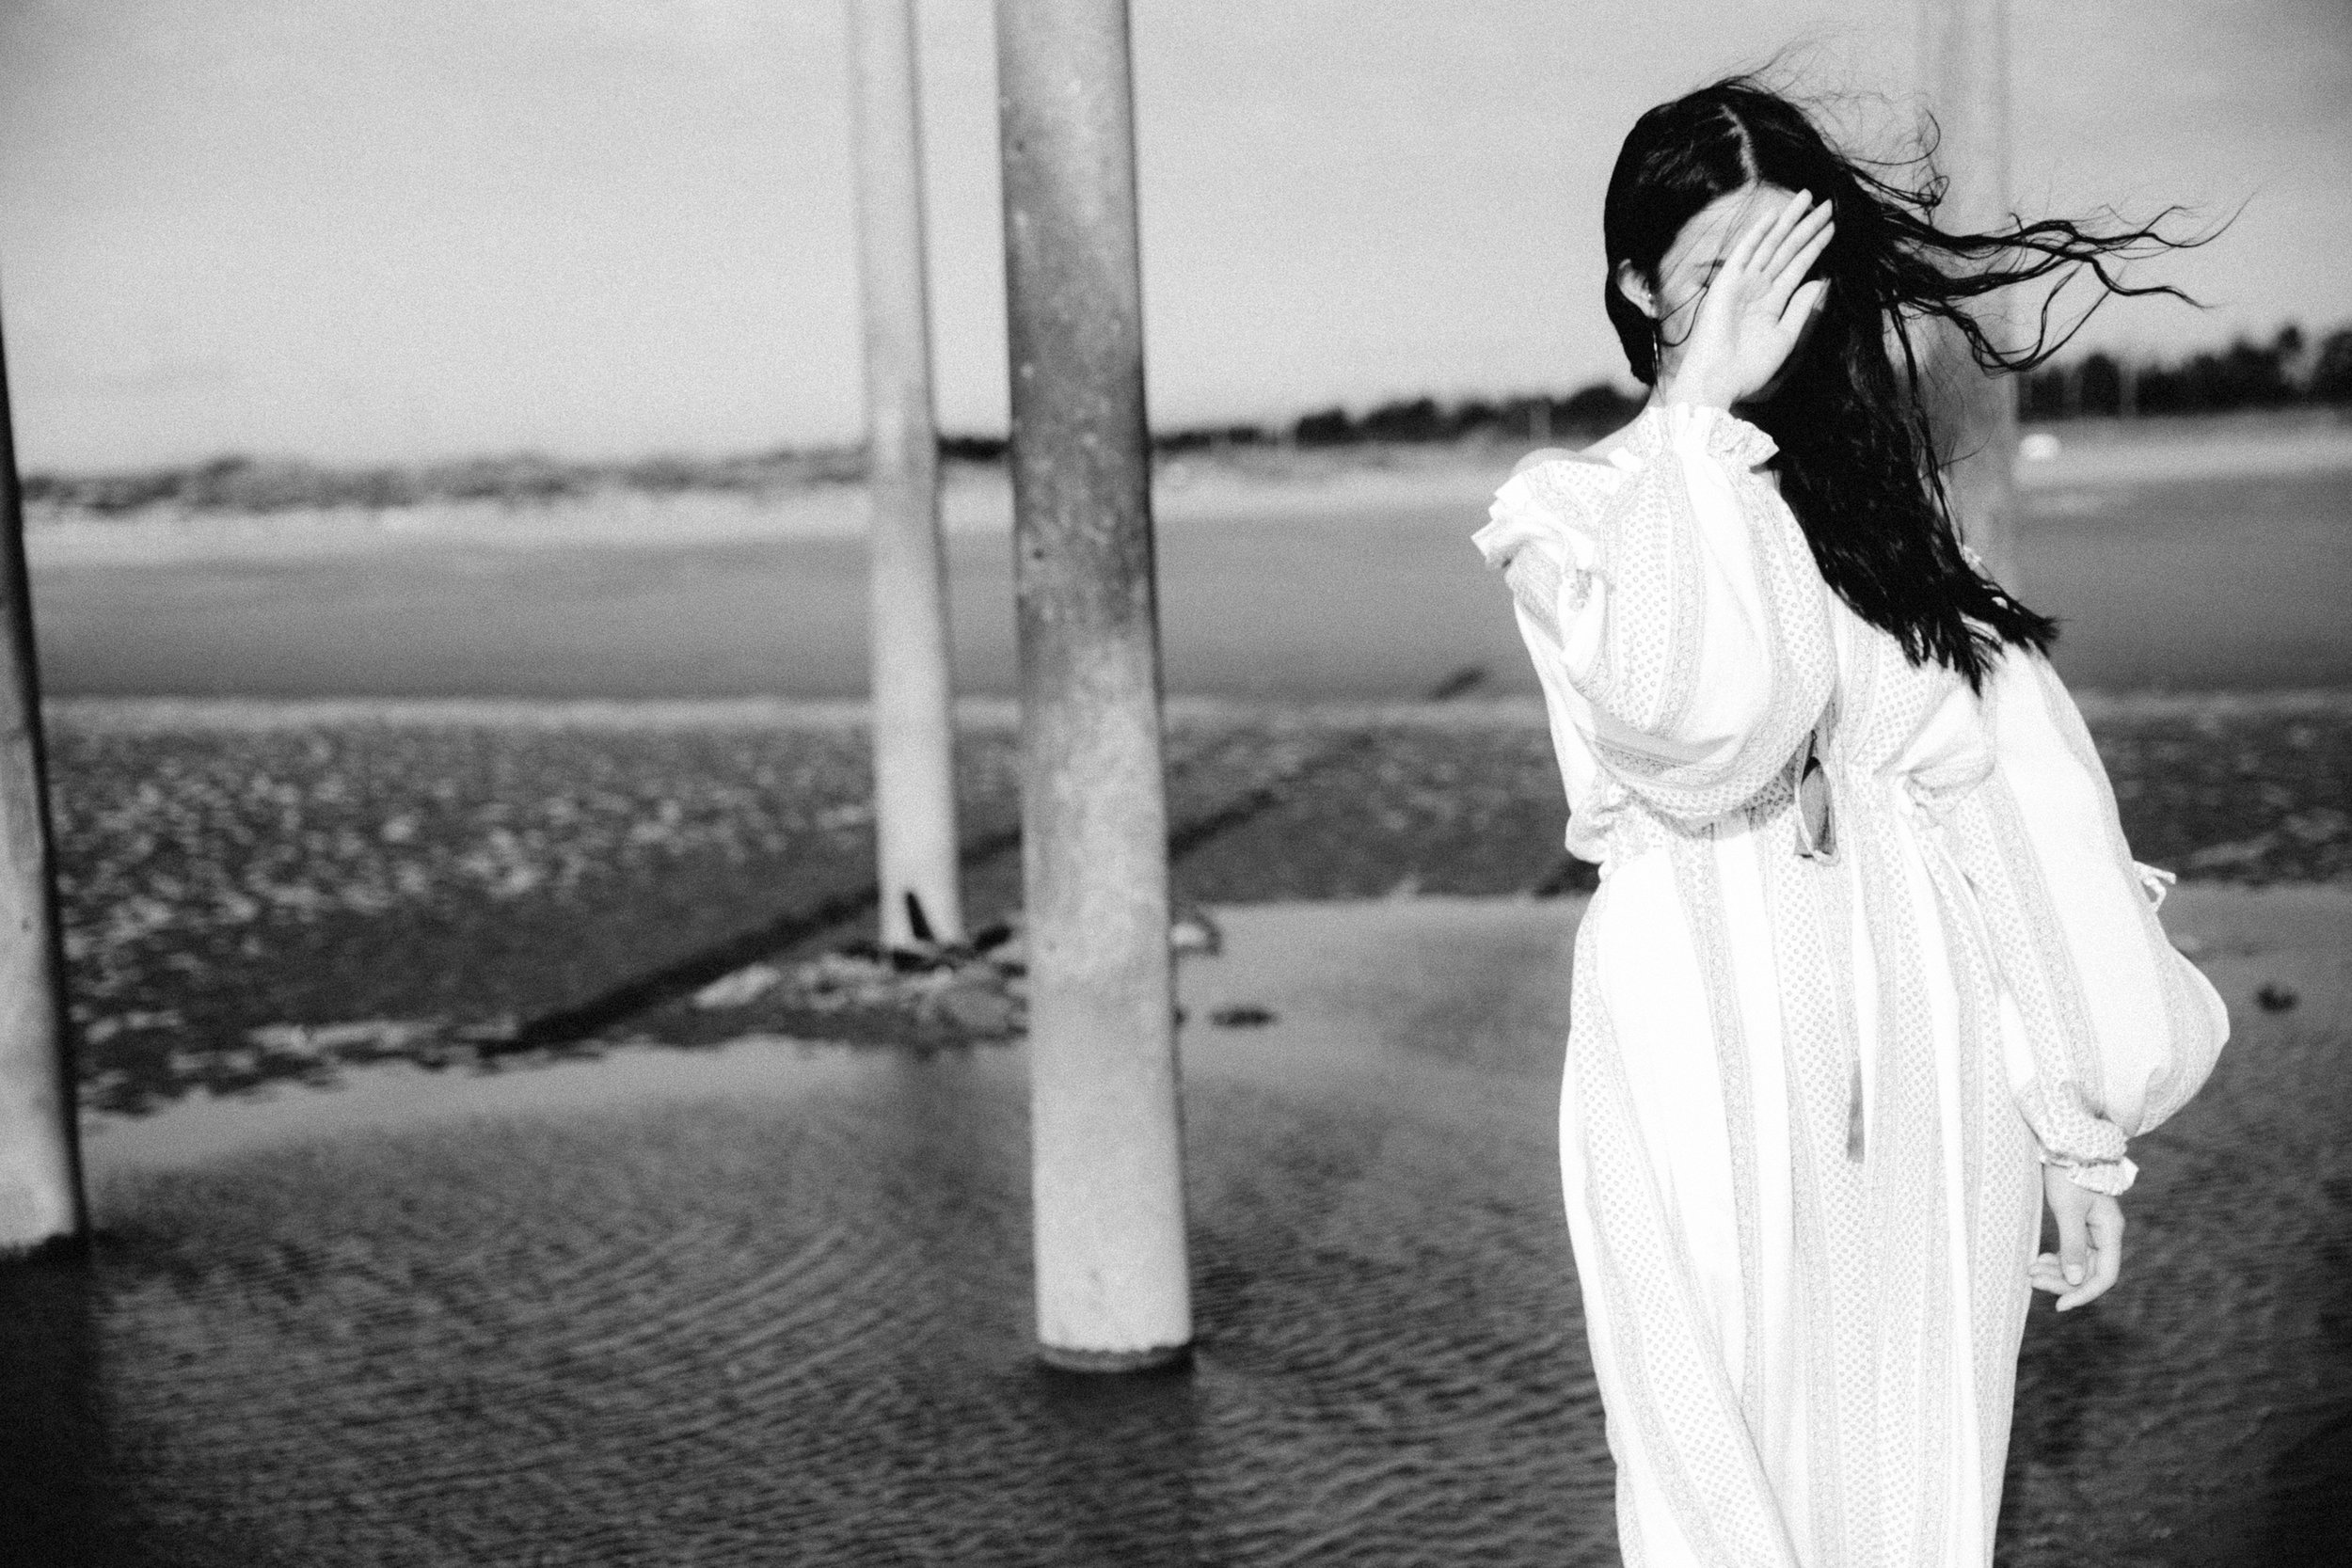 portrait-jane-girl-寫真-許厝港-桃園-26.jpg